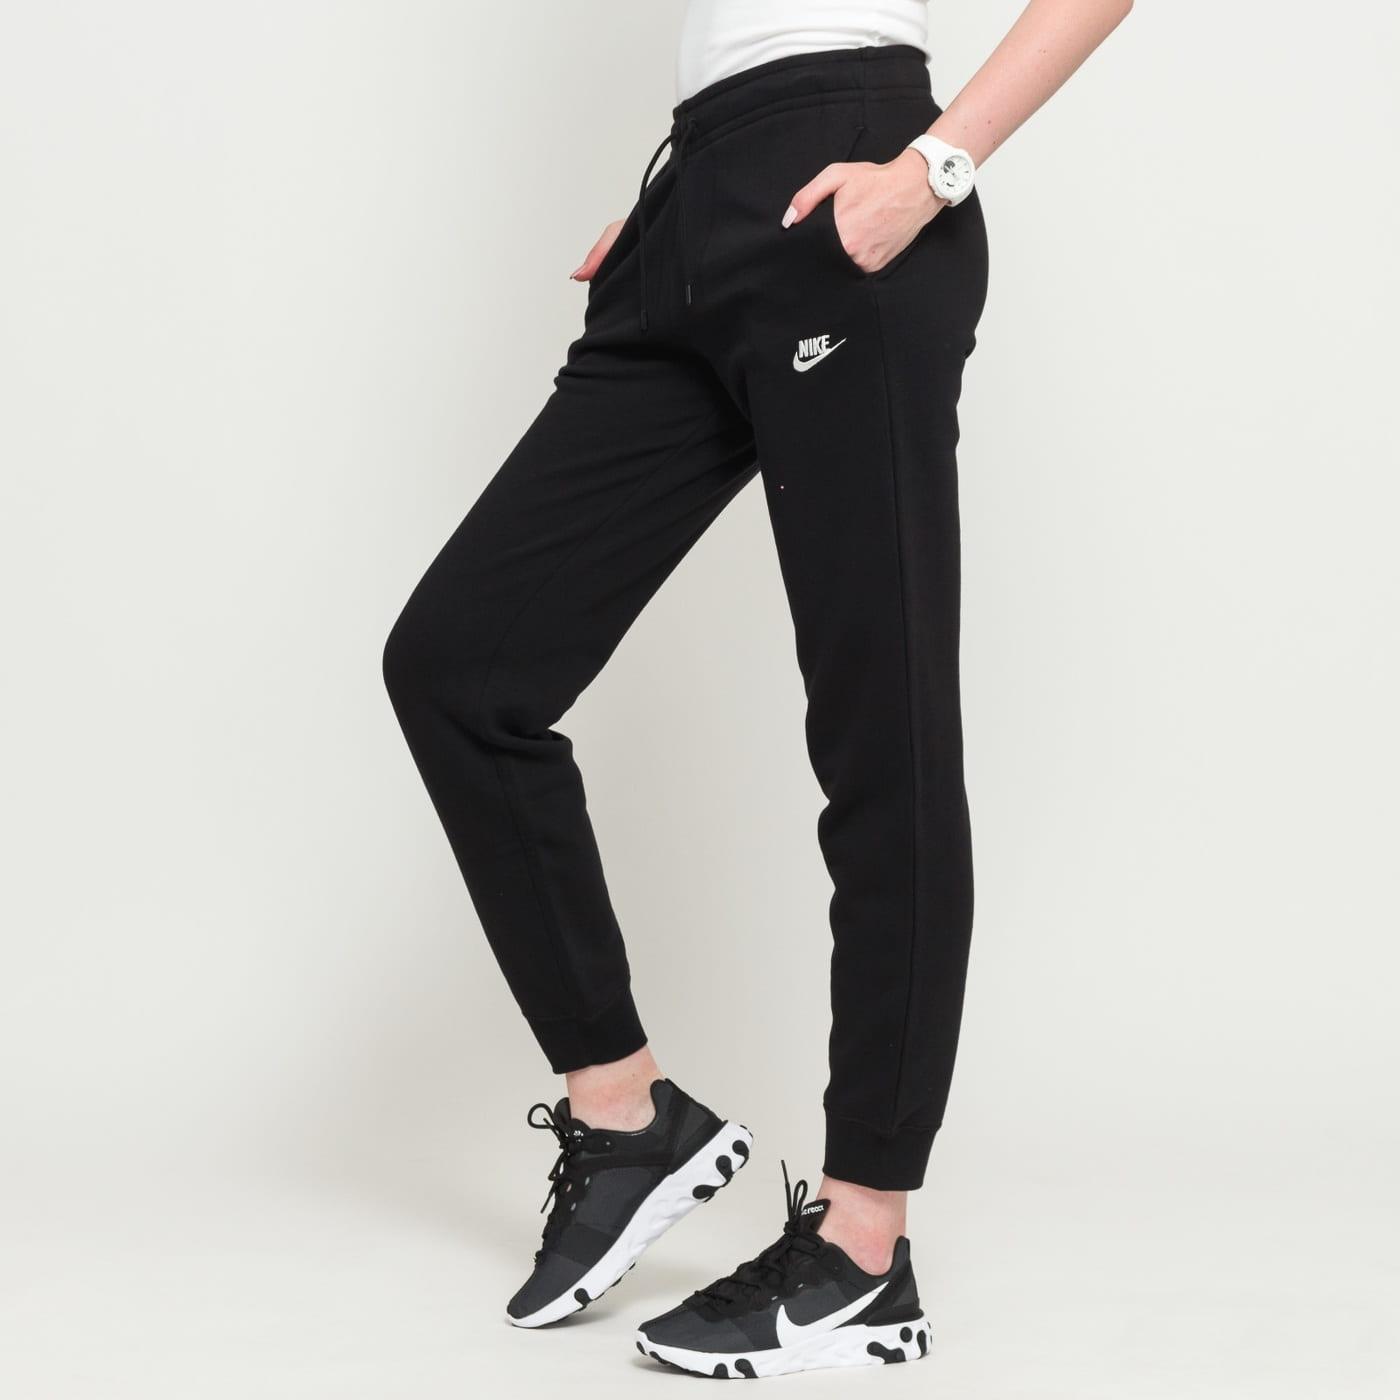 pantaloni cotone uomo nike